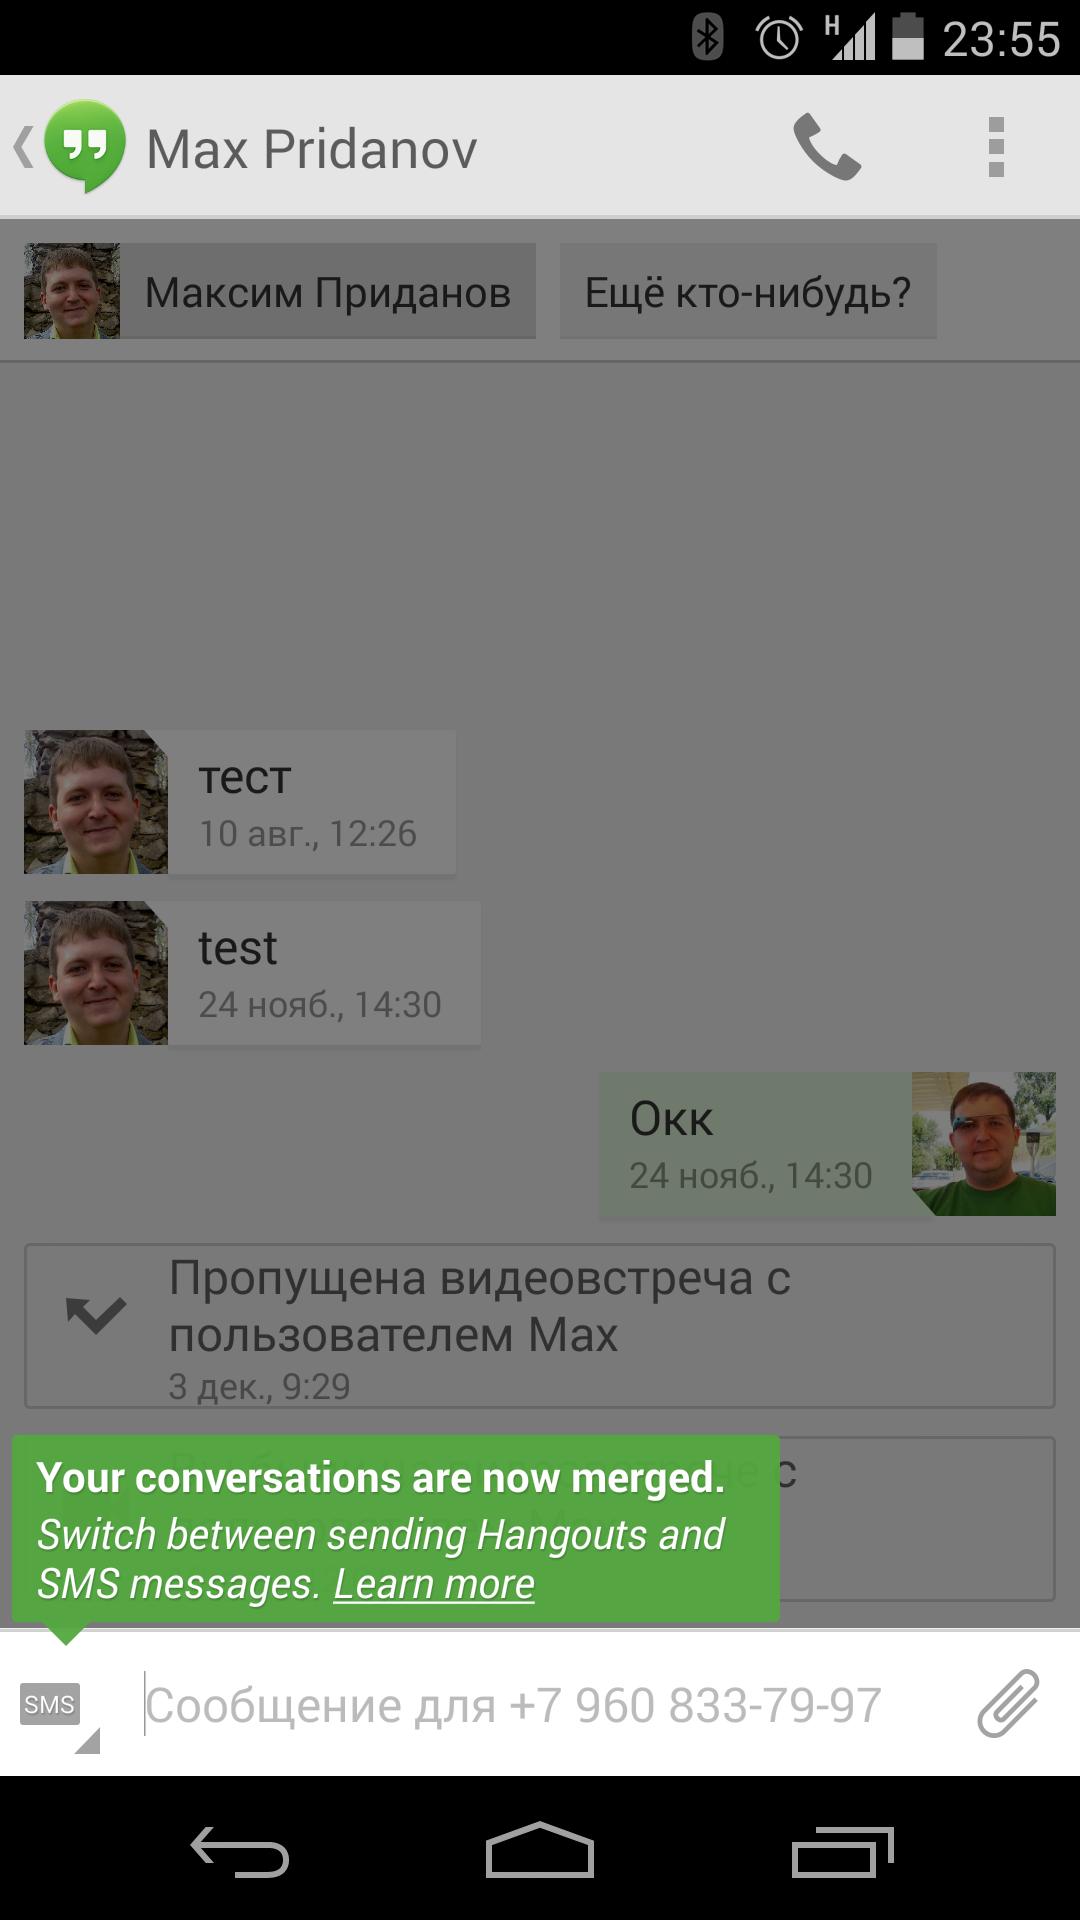 Hangouts 2.1.075 (1123407-30)